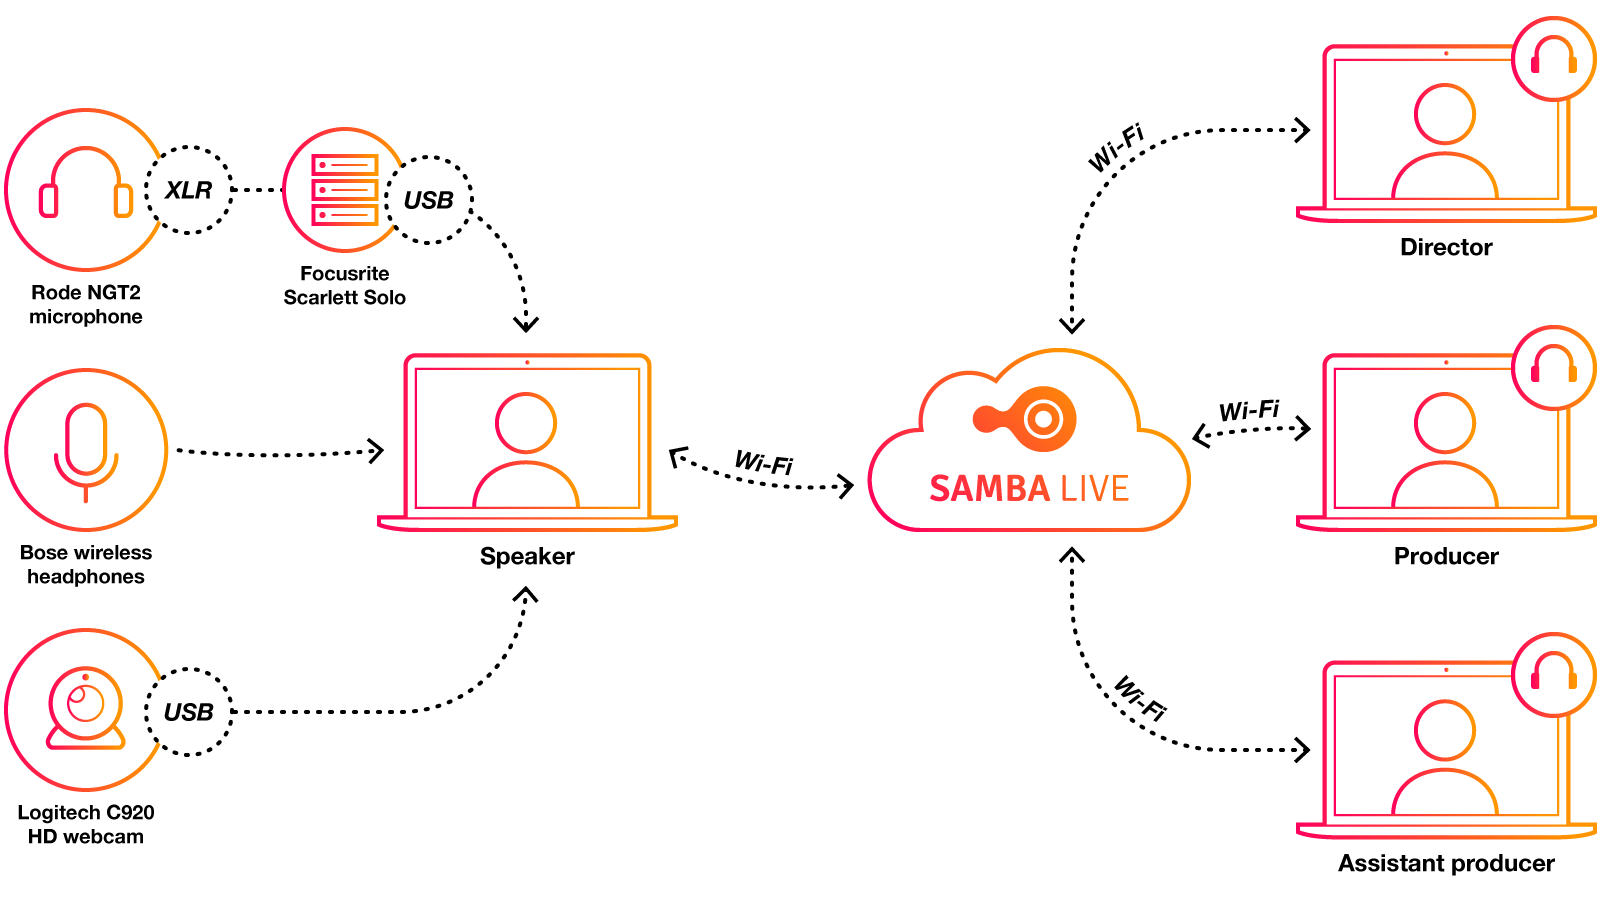 Global Pitch Samba Live technical set-up